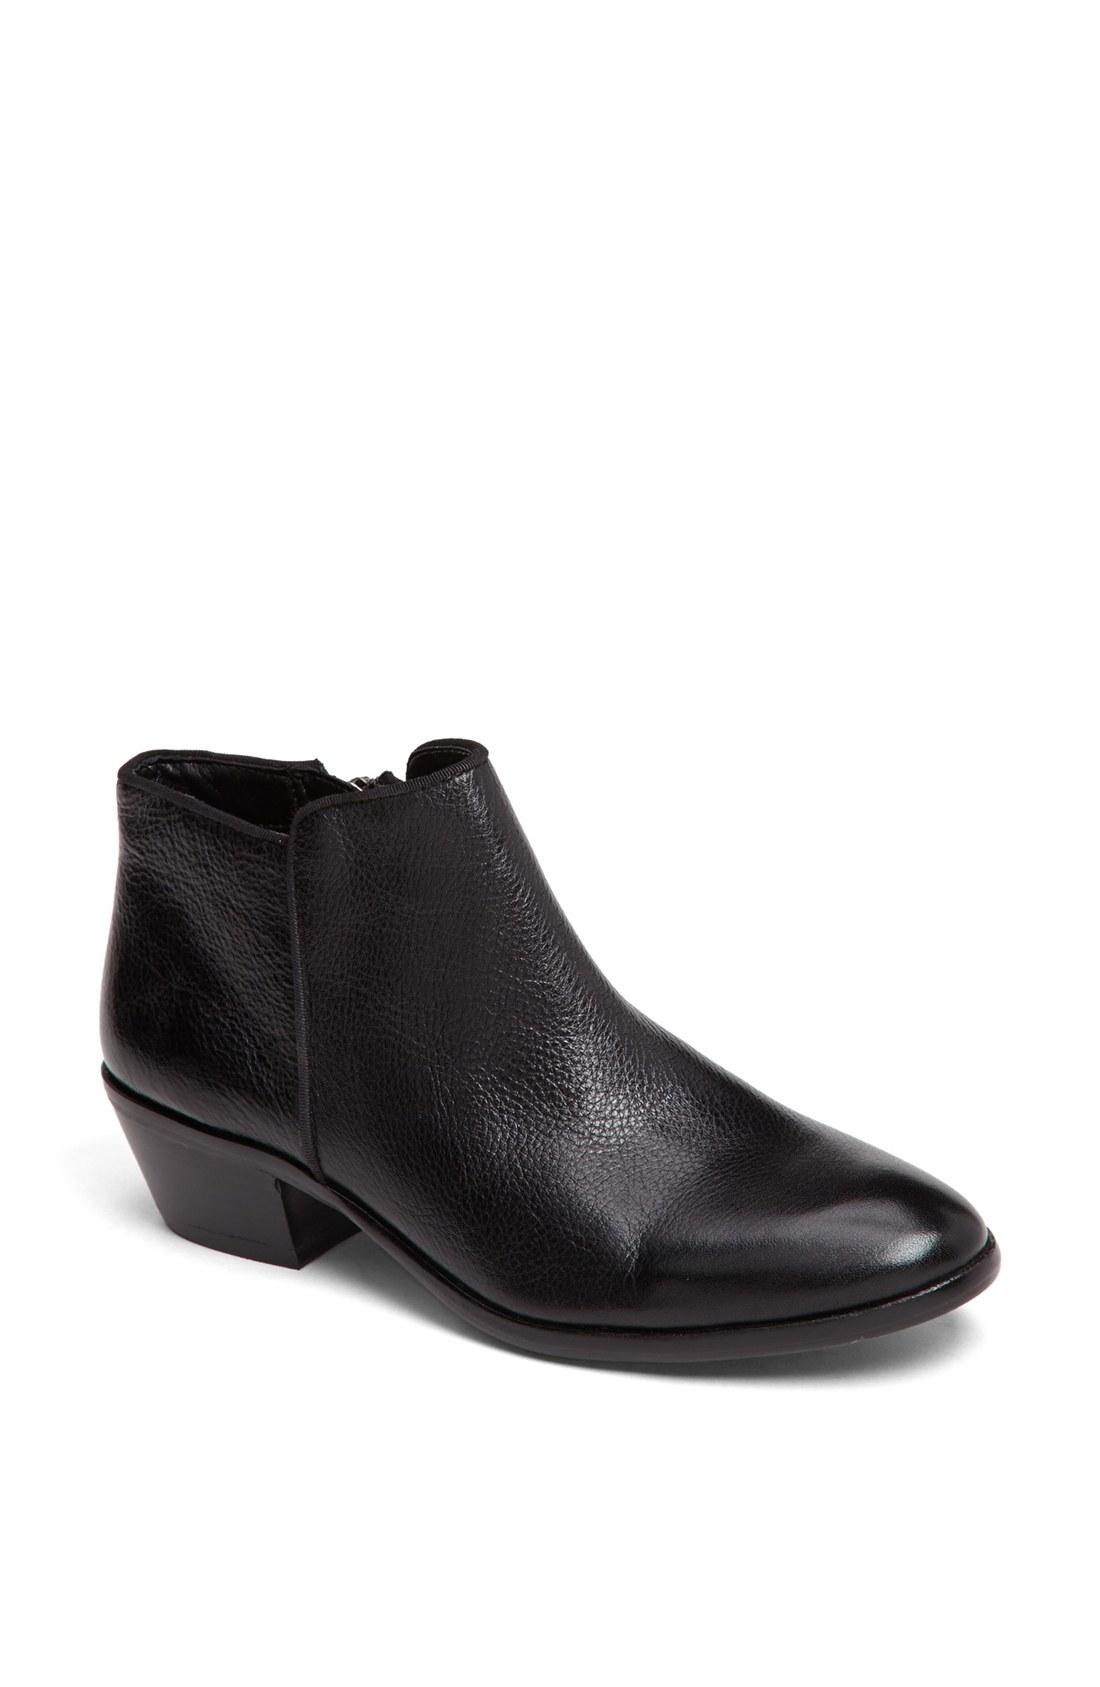 sam edelman petty bootie in black black leather lyst